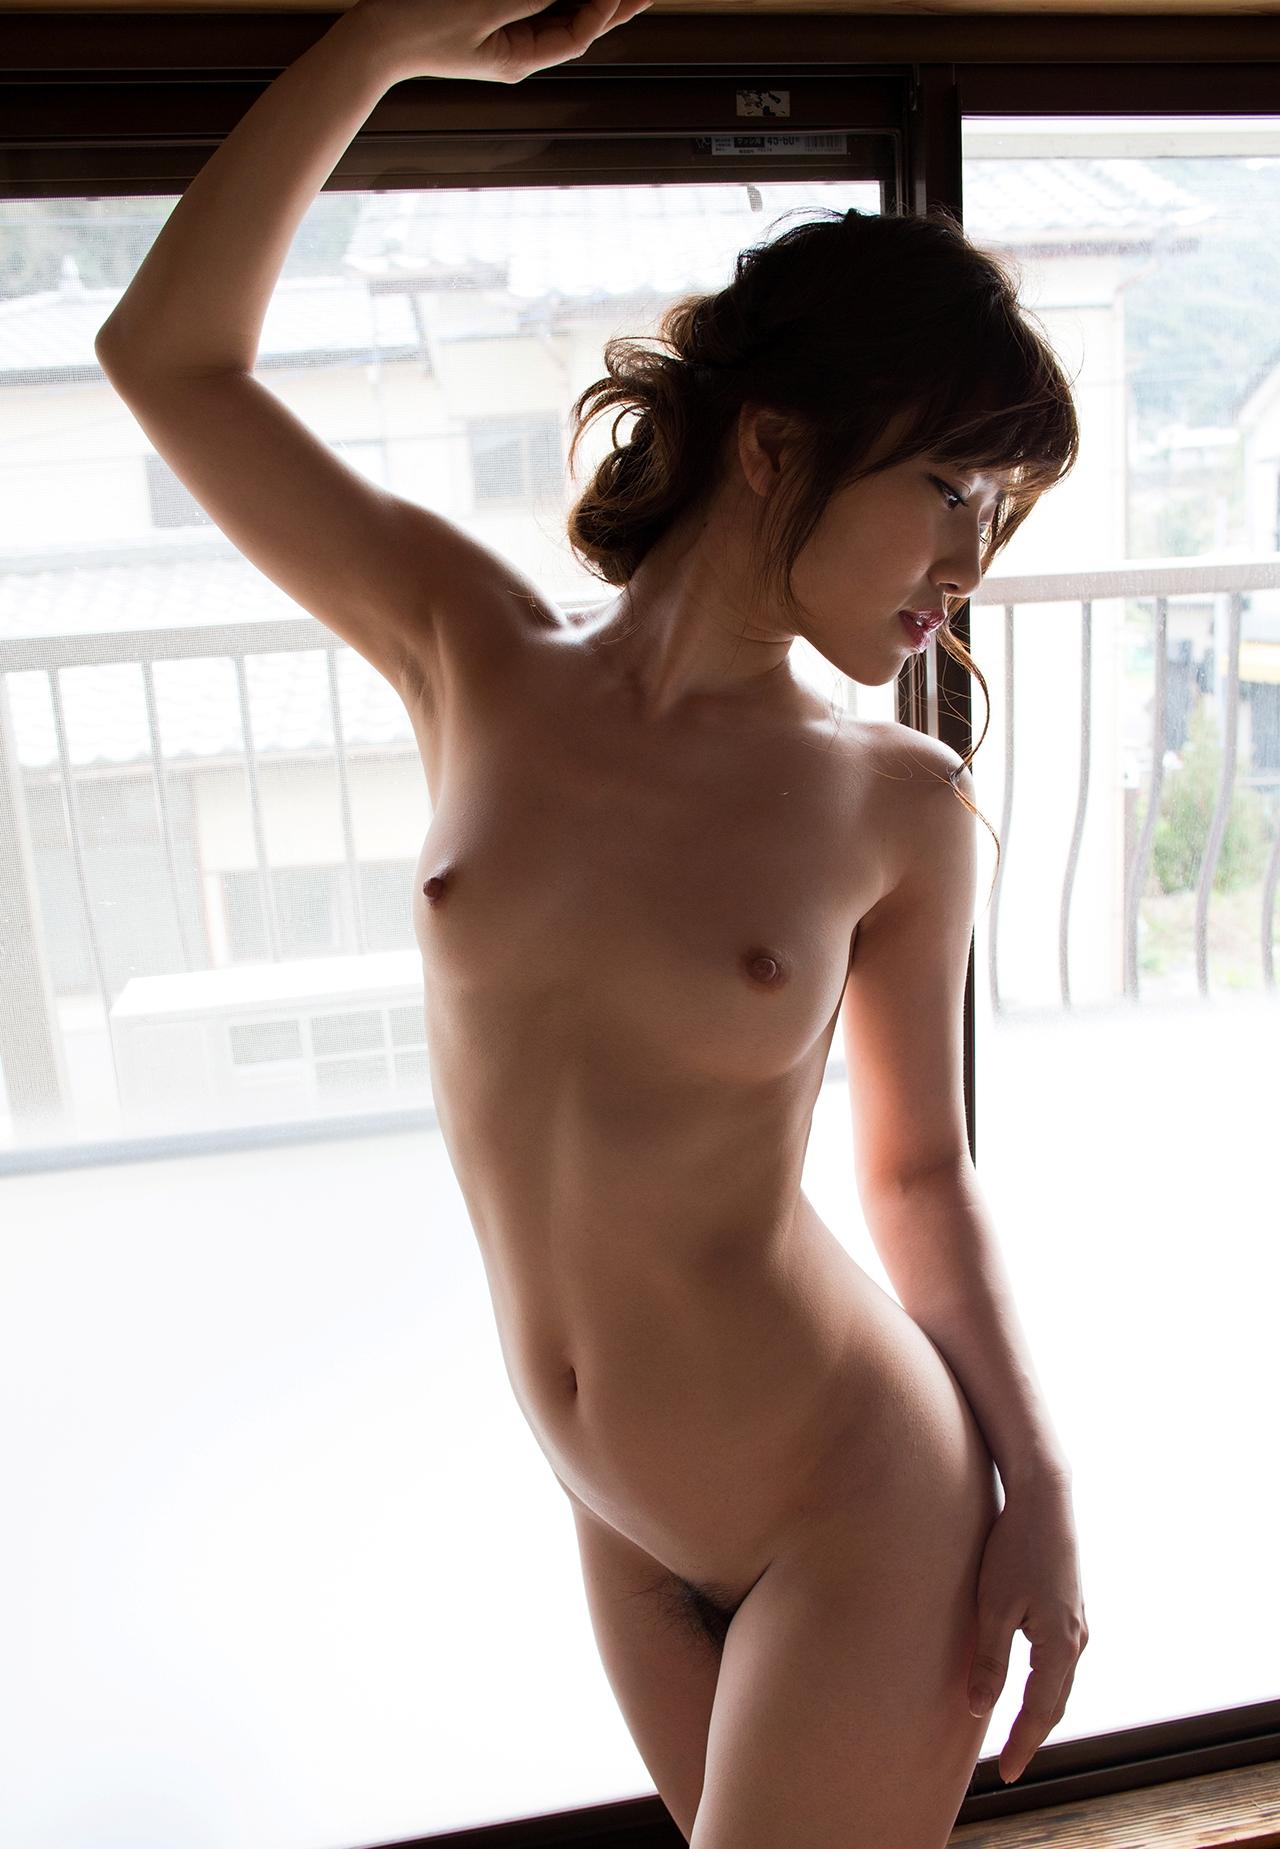 image http://scanlover.com/assets/images/4134-2JGQ5fsTyI8A14Bg.jpeg